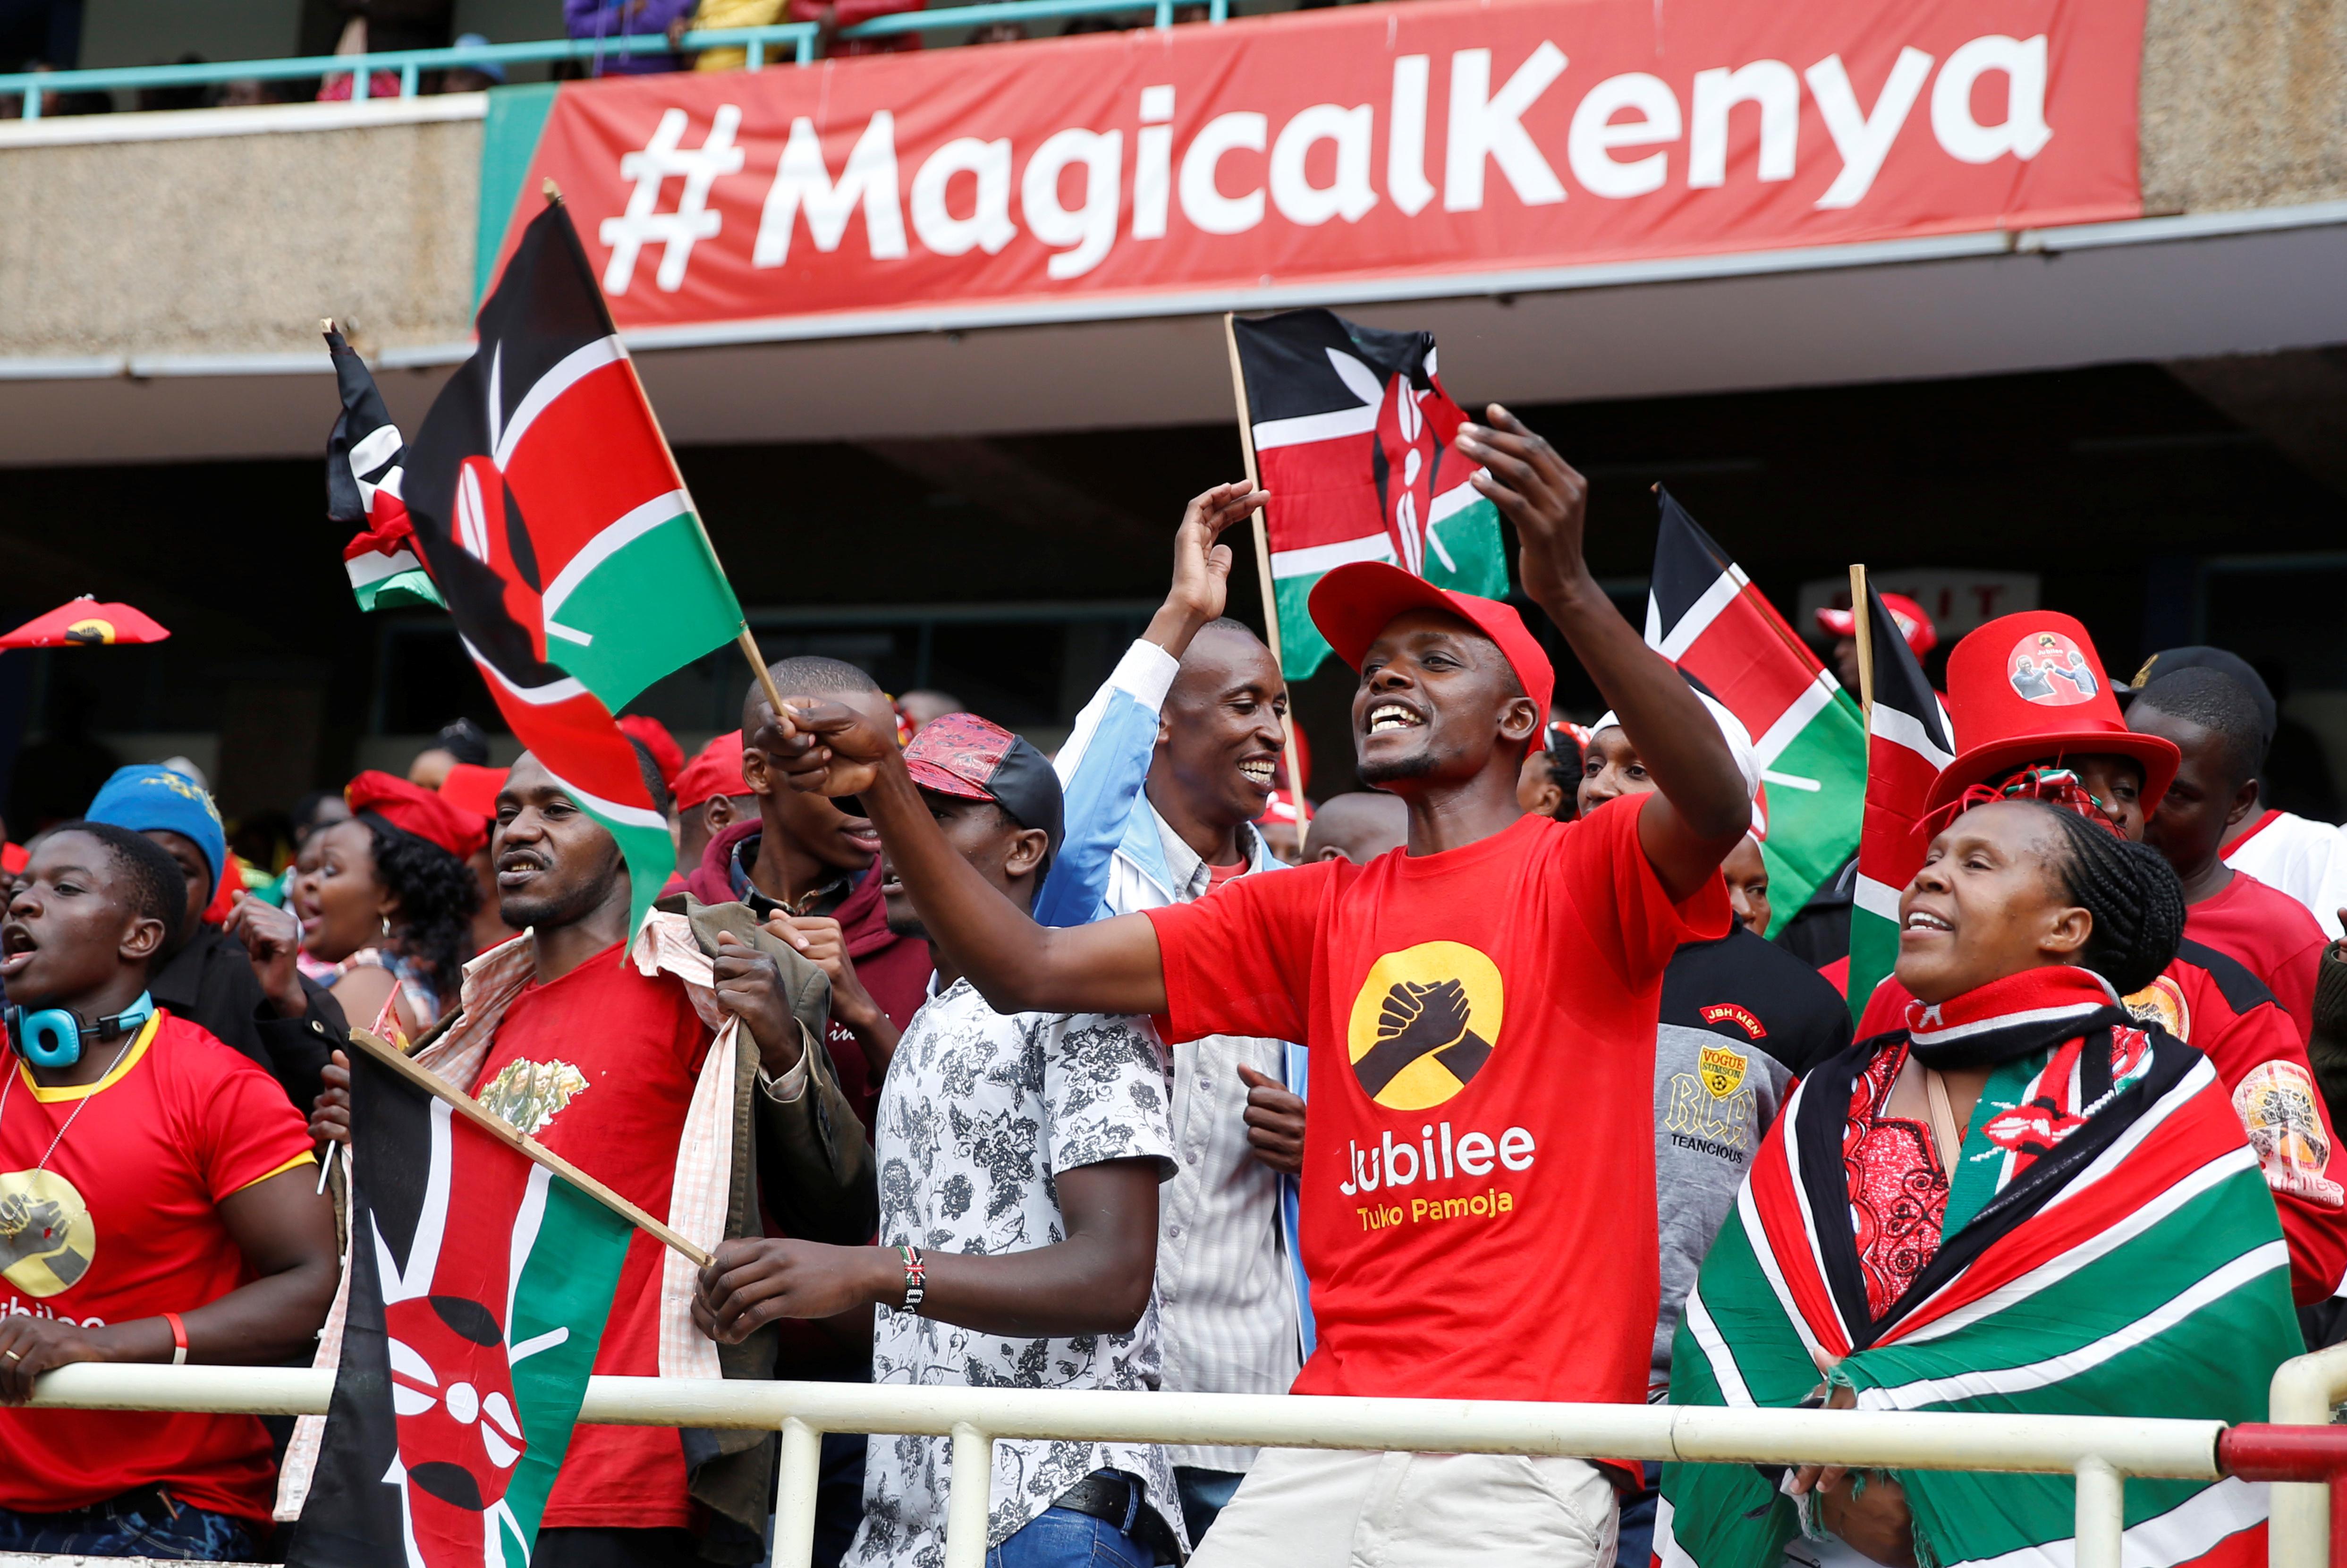 تنصيب رئيس كينيا (1)